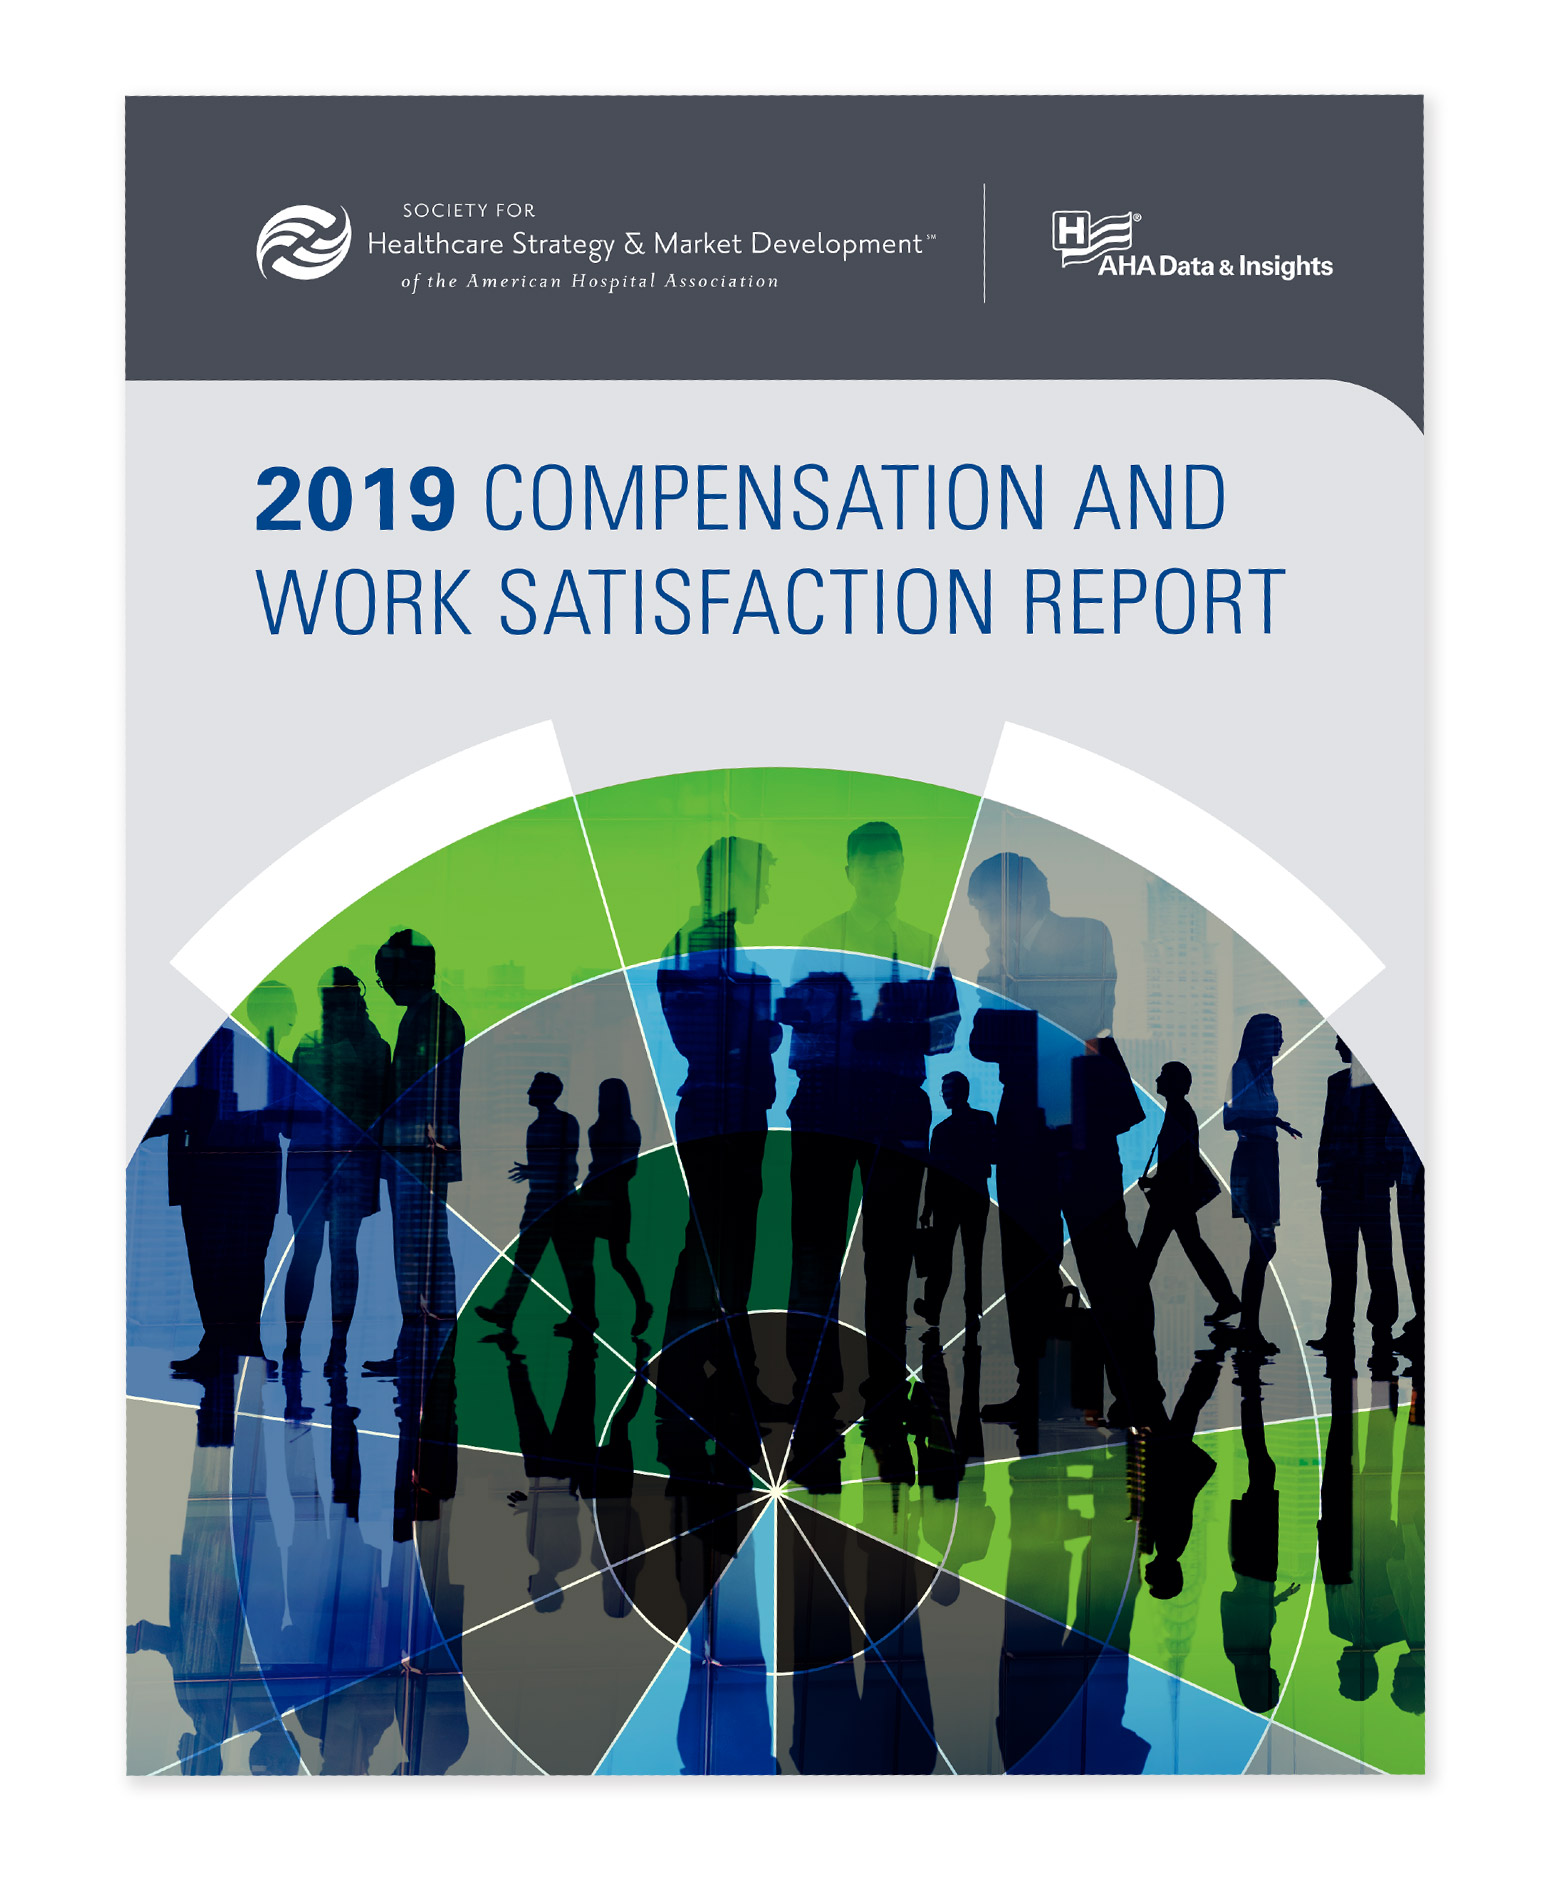 SHSMD 2019 Compensation and Benefits Report Design by Hughes Design